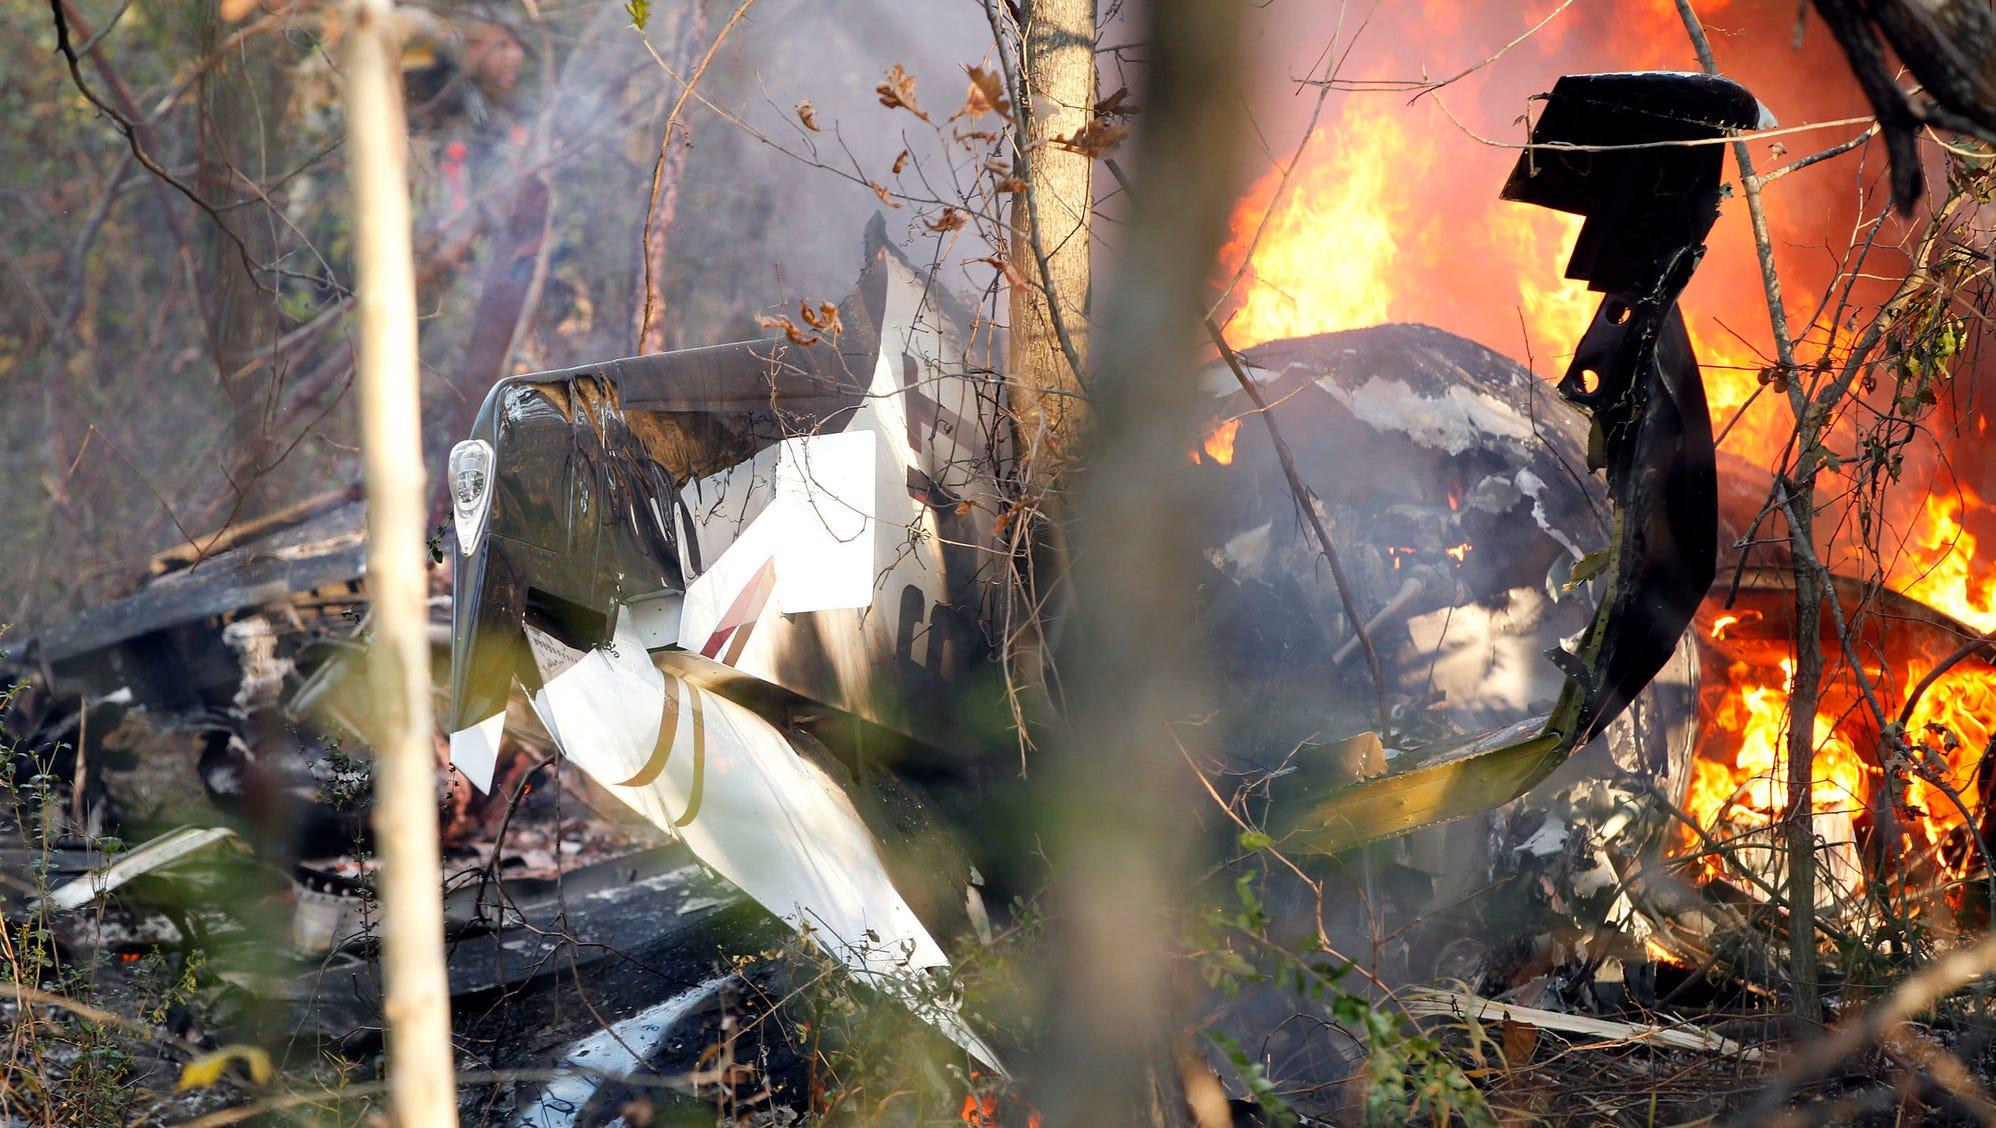 Bruce Jenner Car Crash Victim Identified as Neighbor Kim Howe